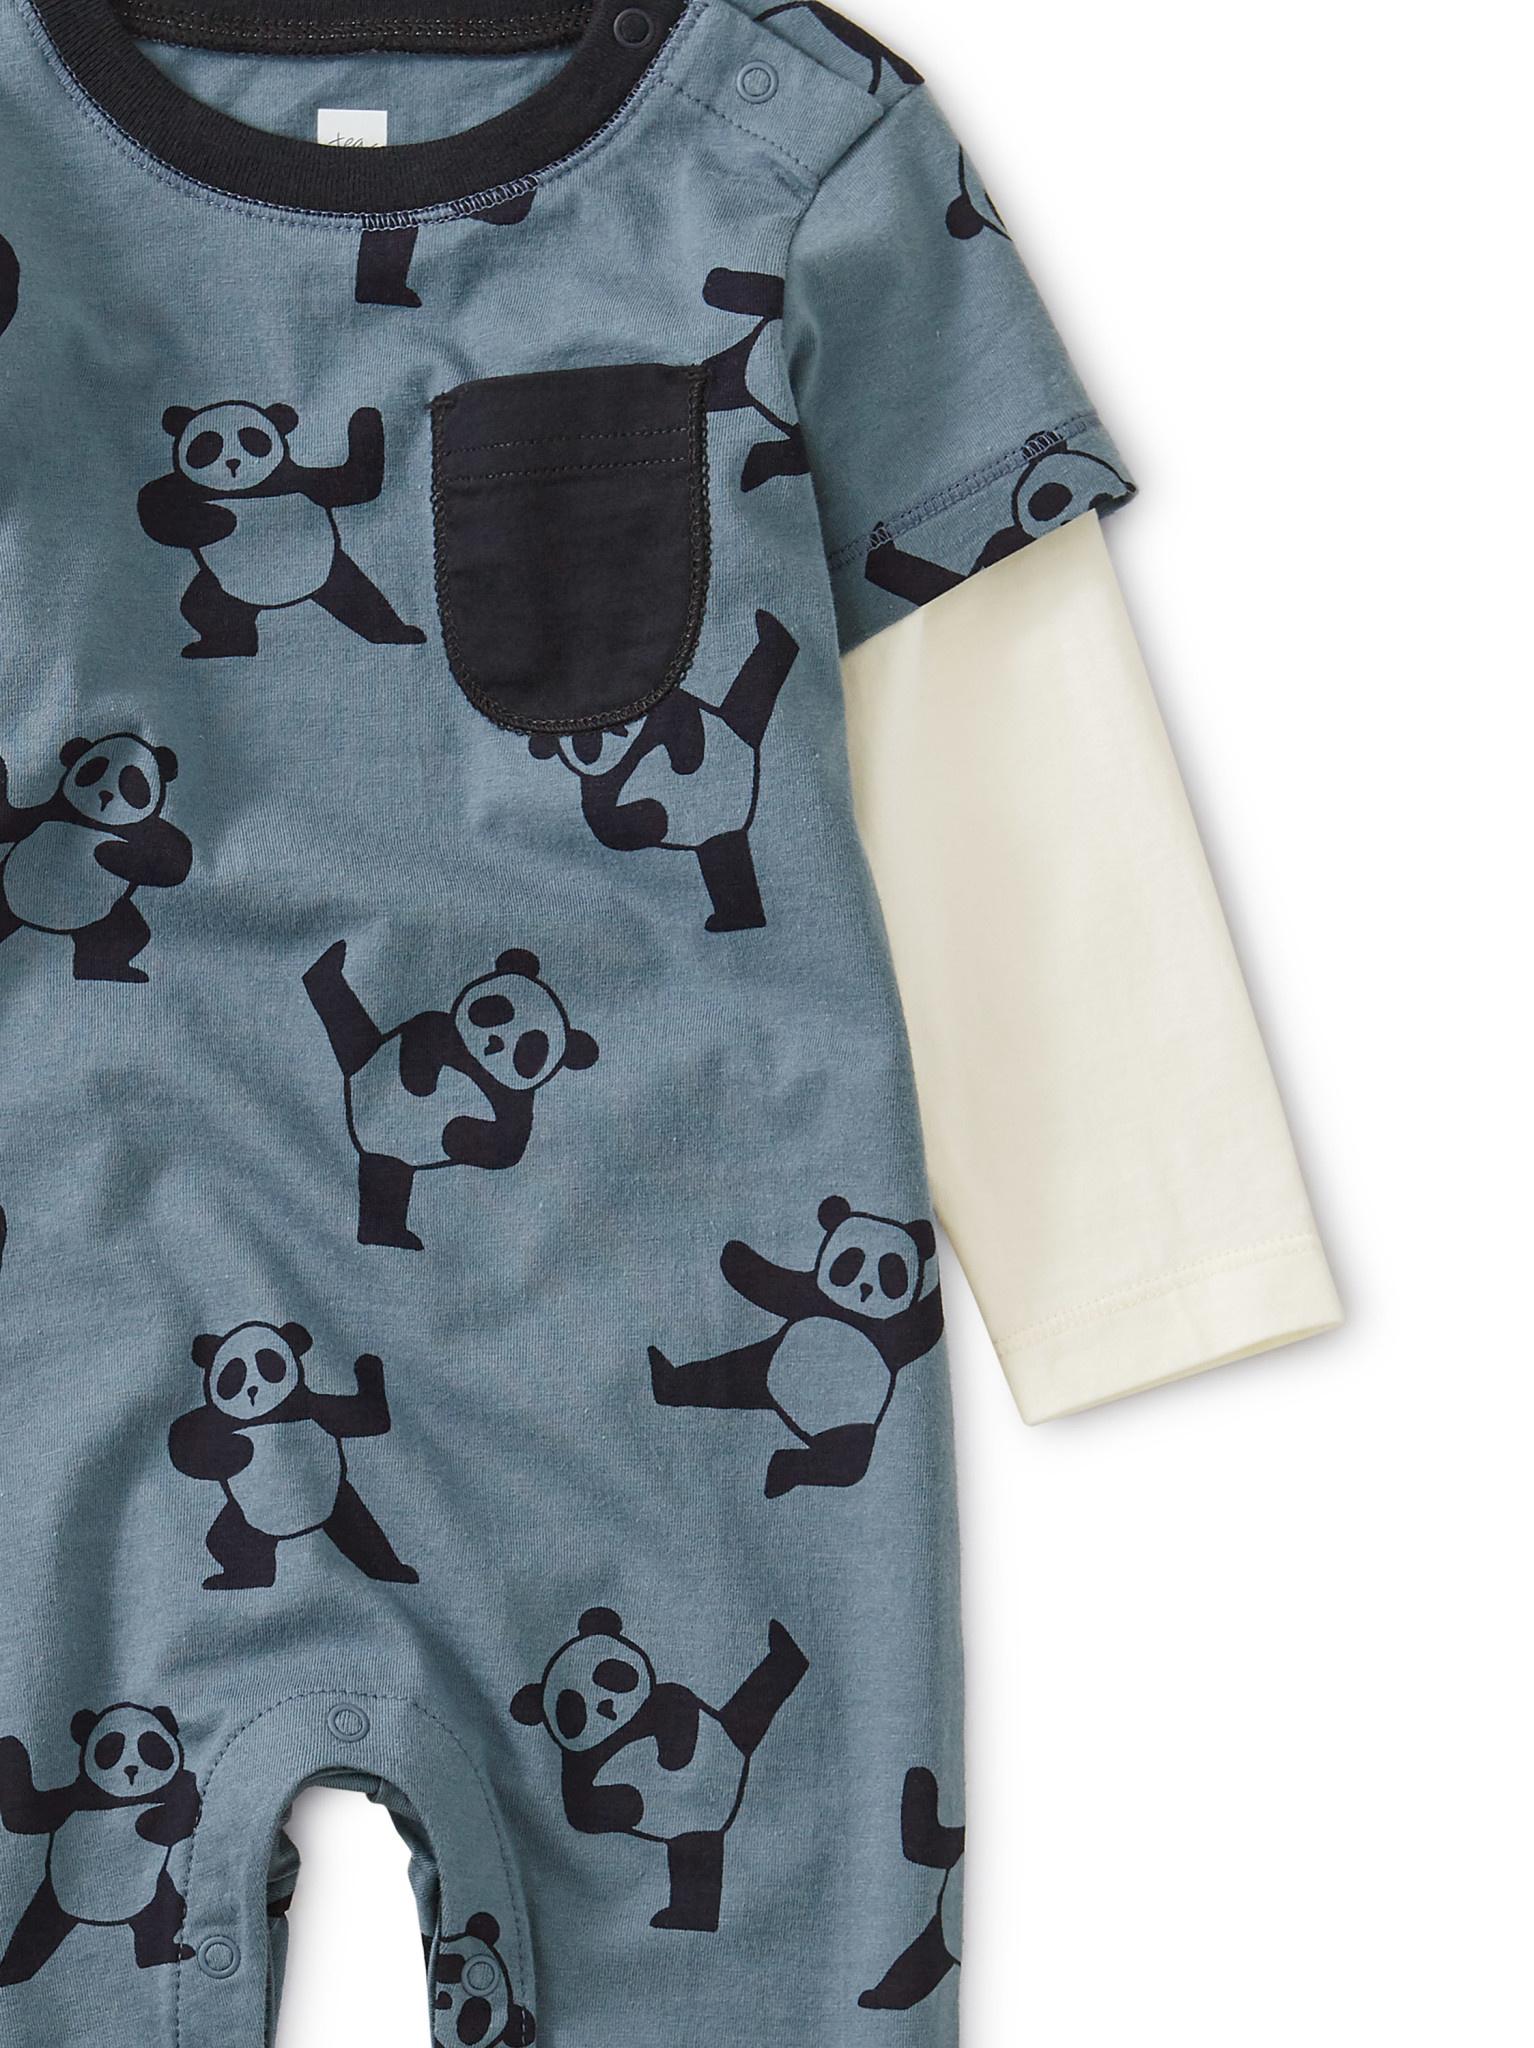 Tea Collection Panda Power Romper